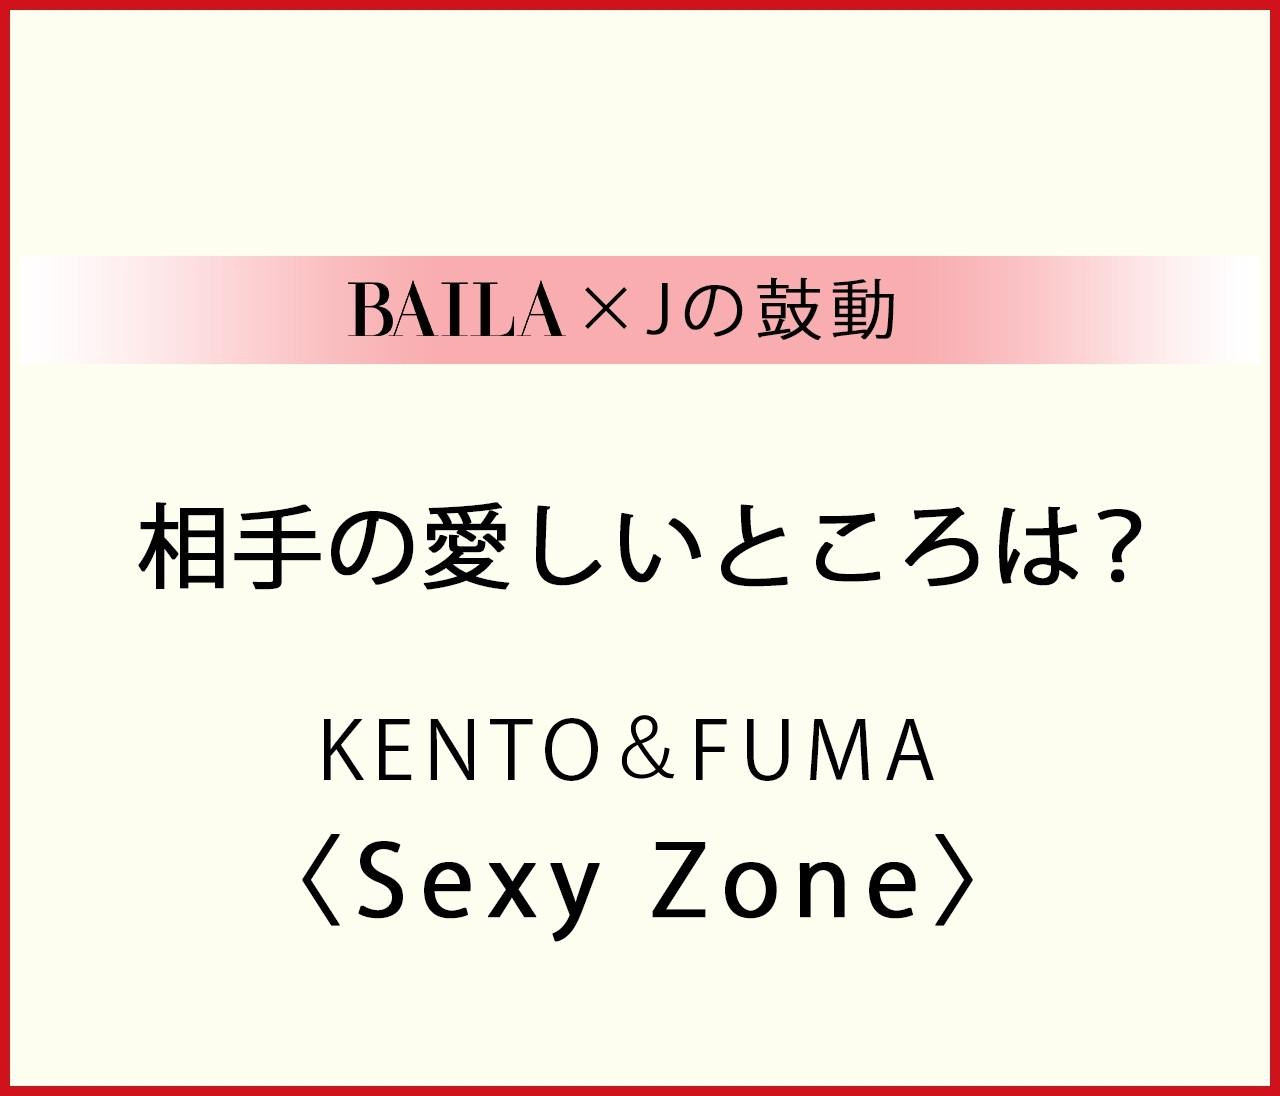 【Sexy Zone】中島健人&菊池風磨、相手の愛しいところは?【BAILA × Jの鼓動】